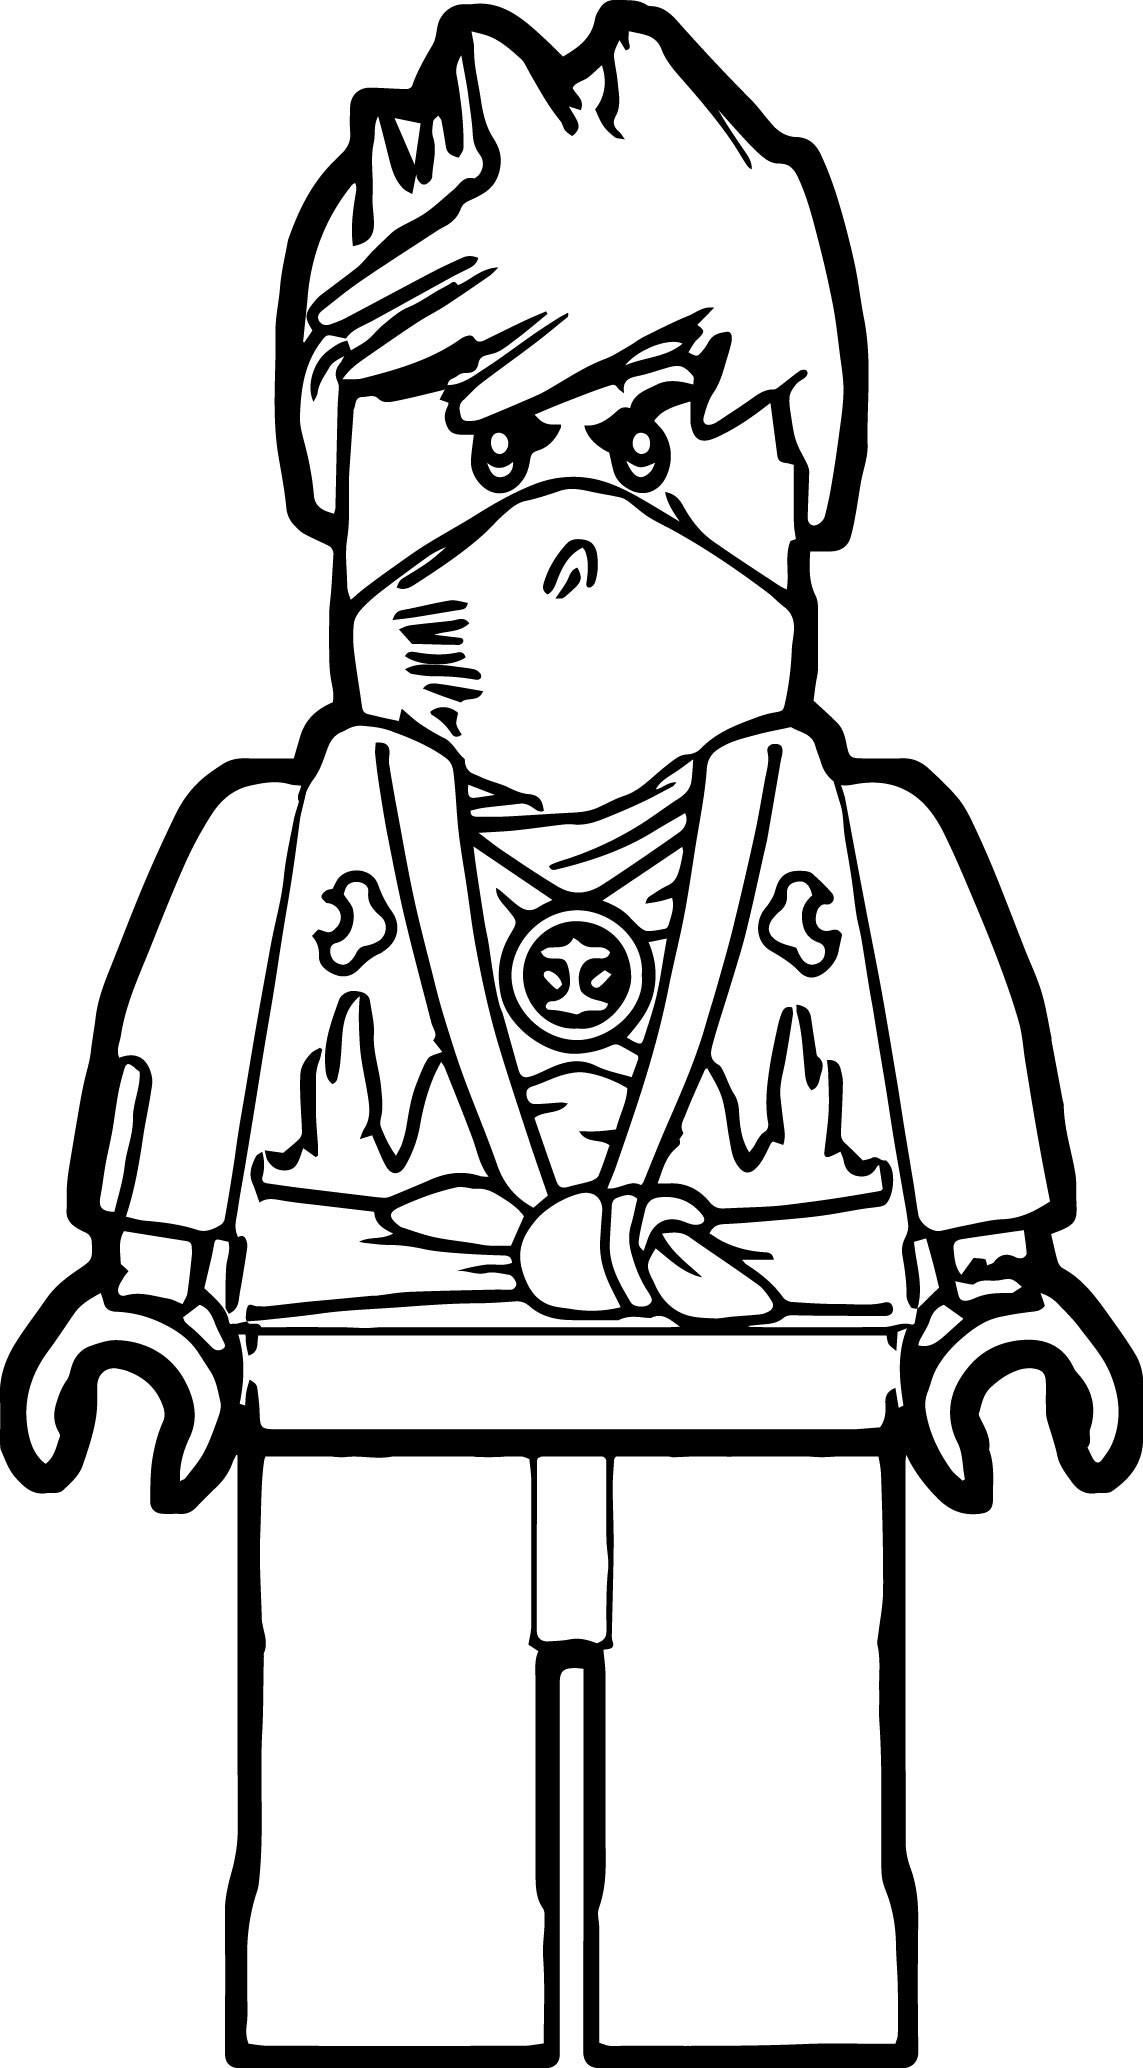 Free Ninjago Coloring Pages at GetDrawings.com | Free for ...